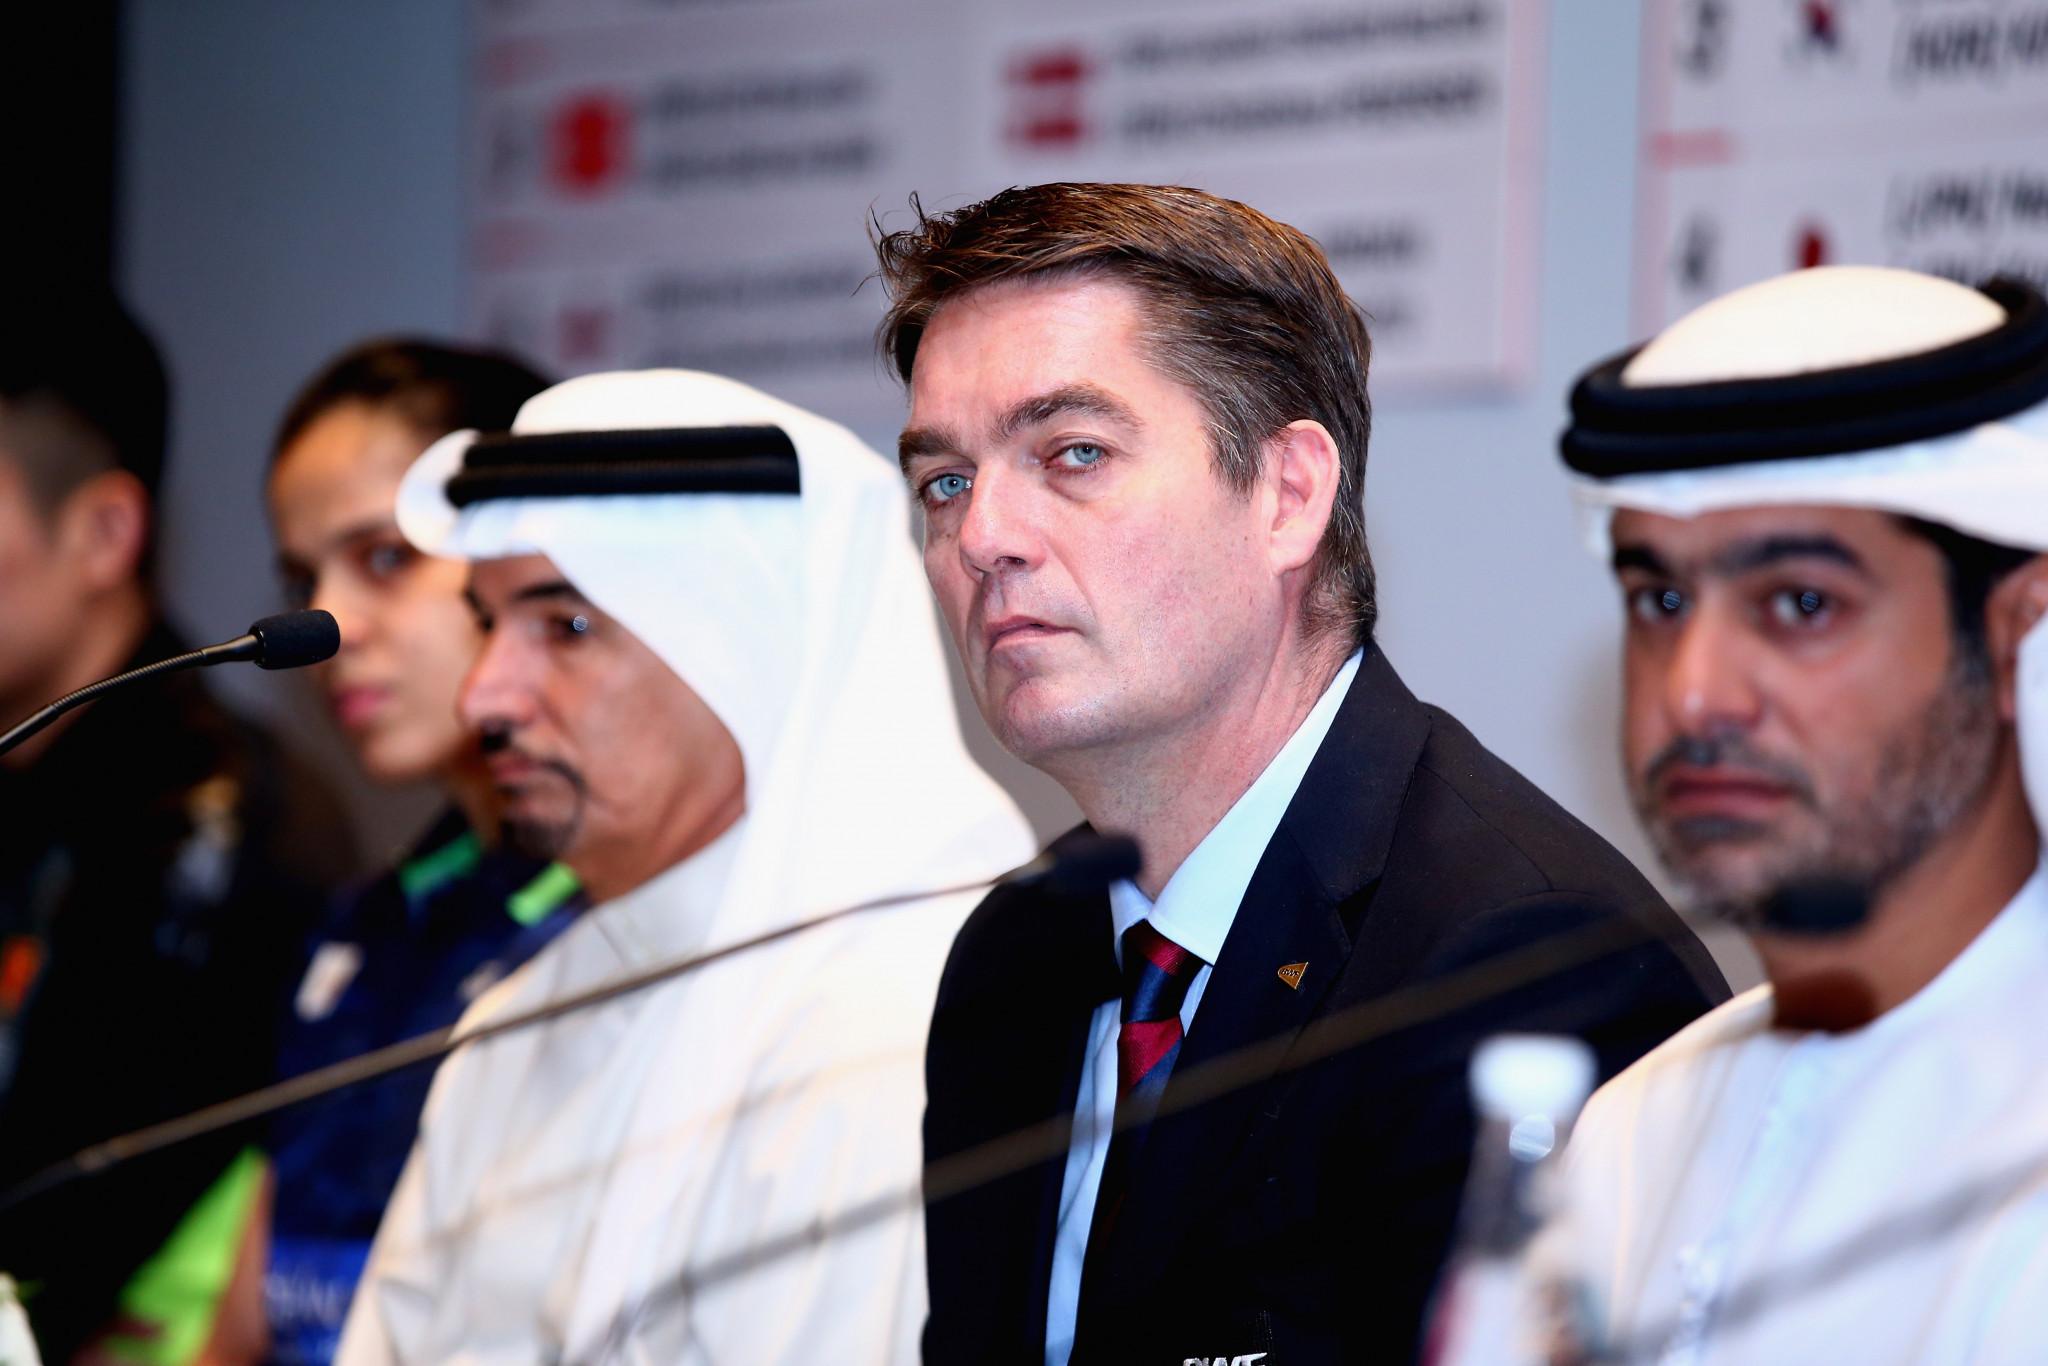 Høyer to return unopposed as Badminton World Federation President